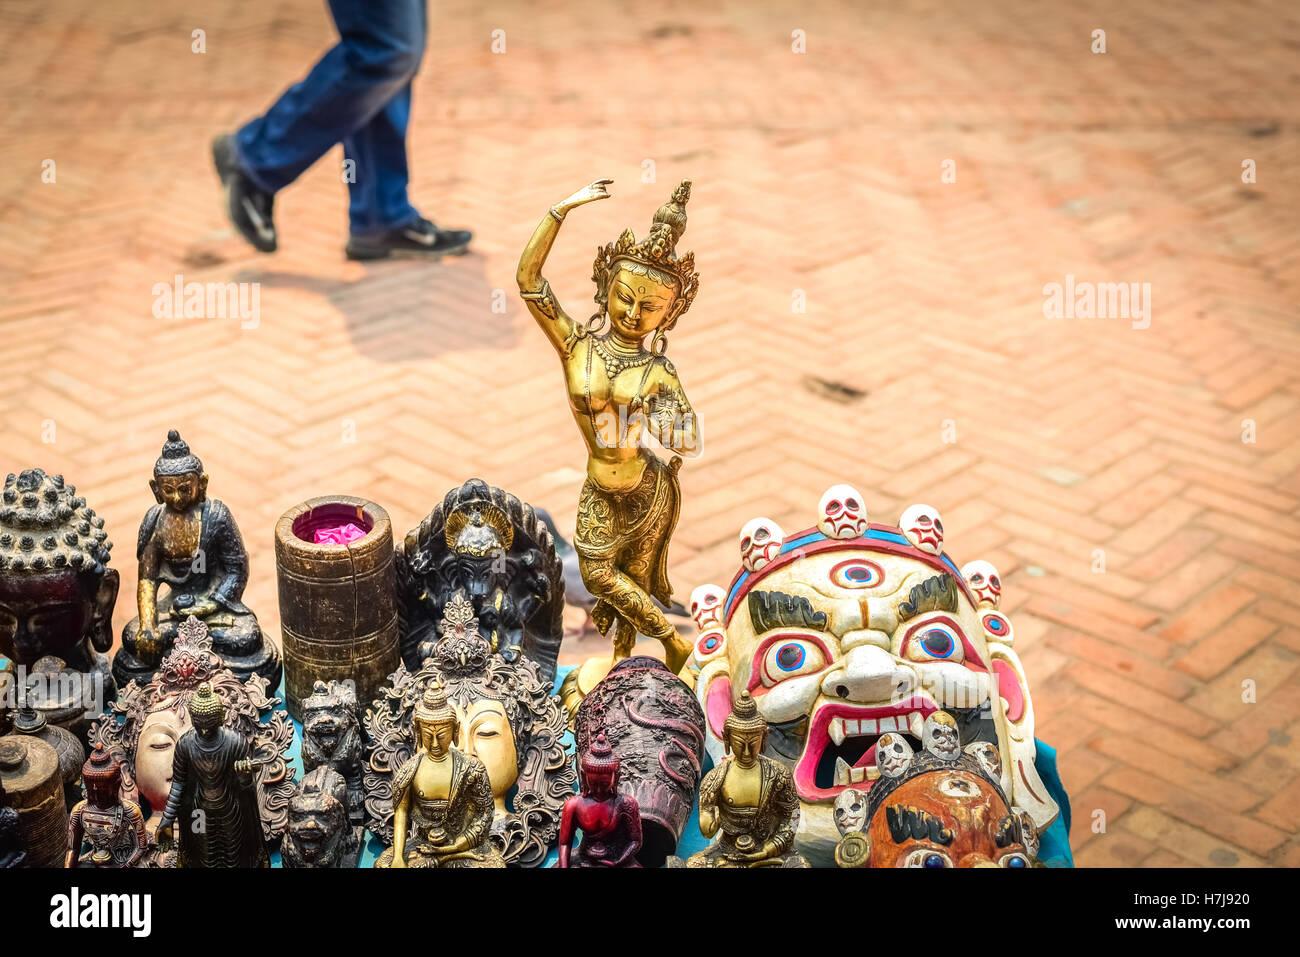 Nepali God Stock Photos & Nepali God Stock Images - Alamy